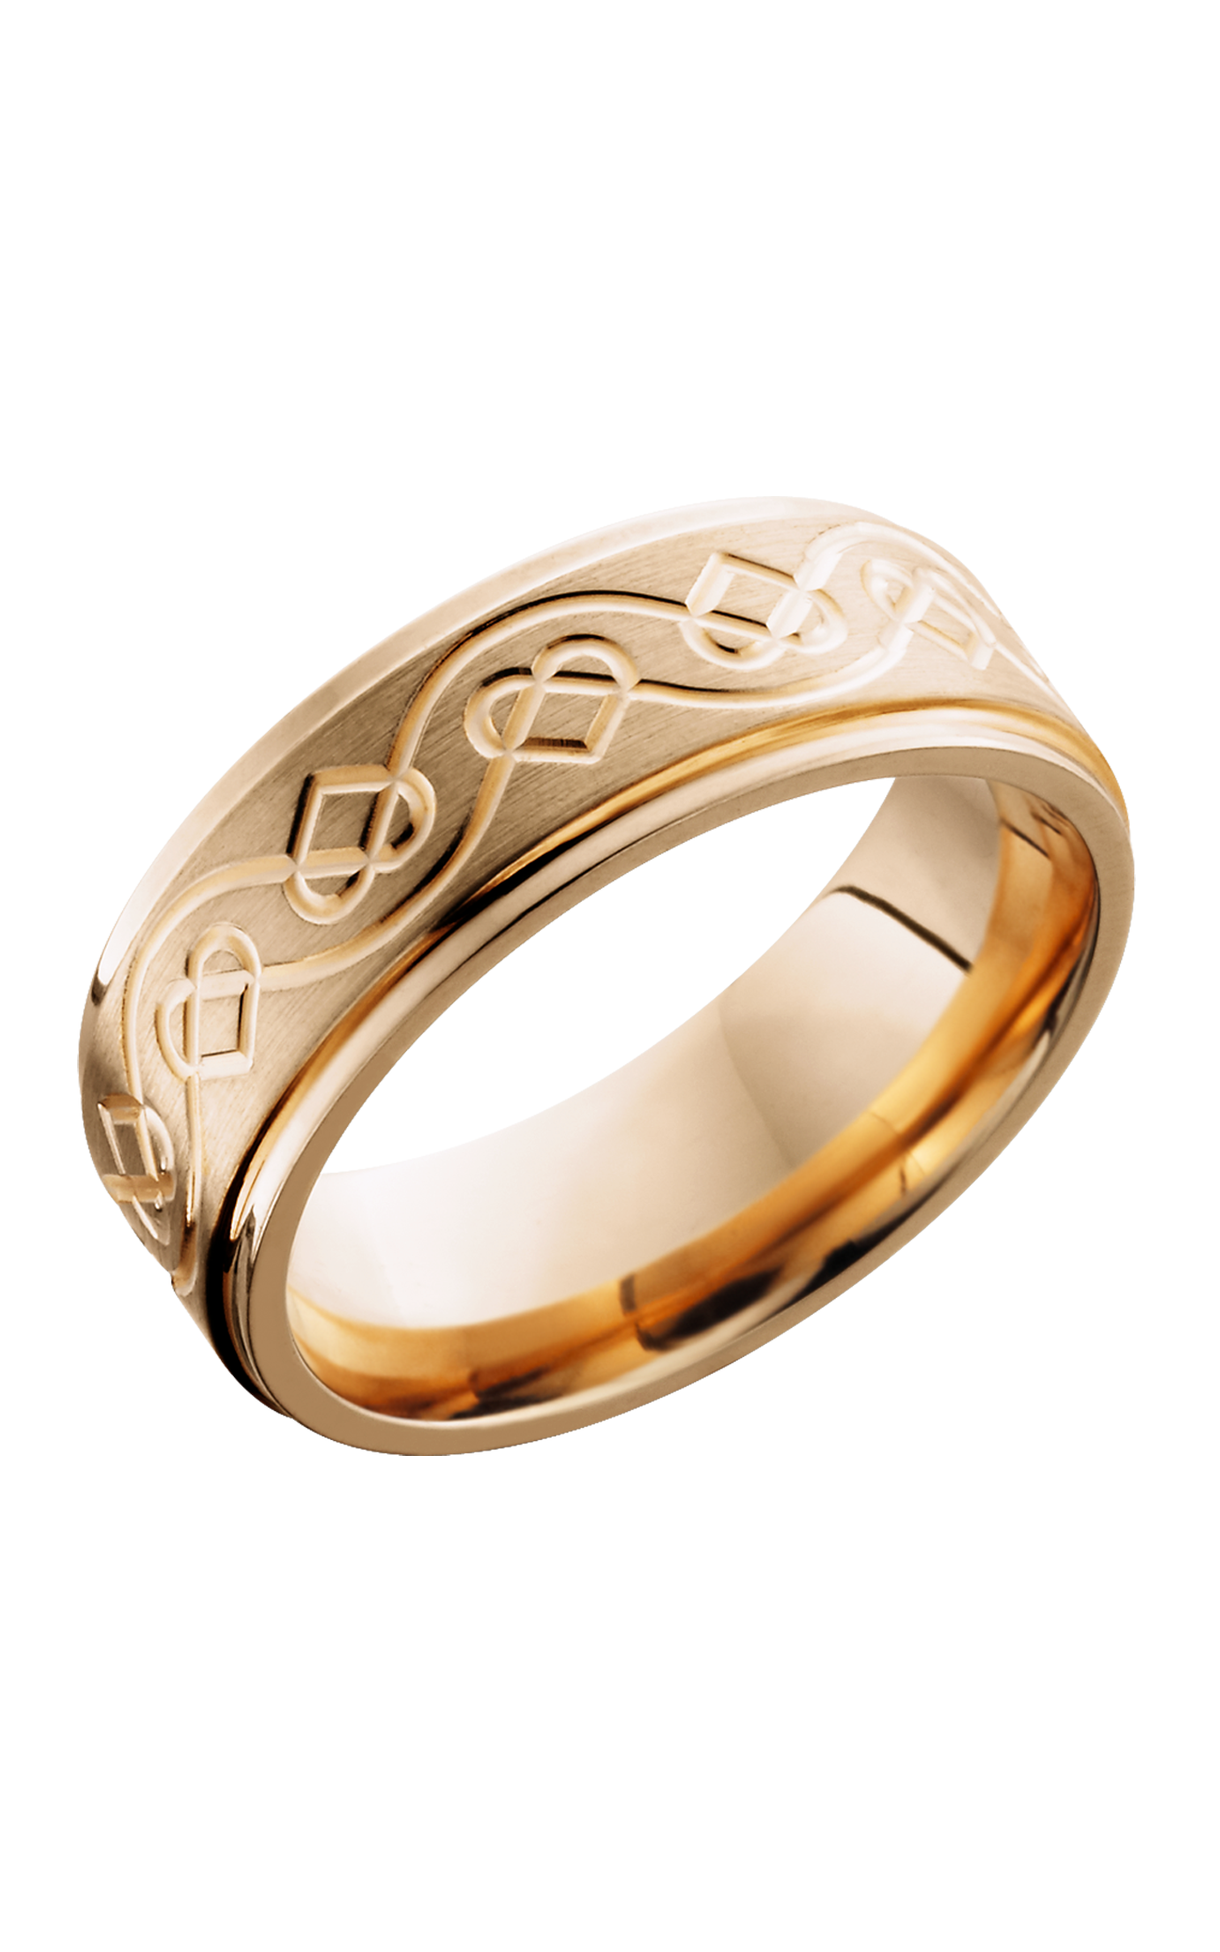 Lashbrook Precious Metals 14KR8FGECELTICHEART product image